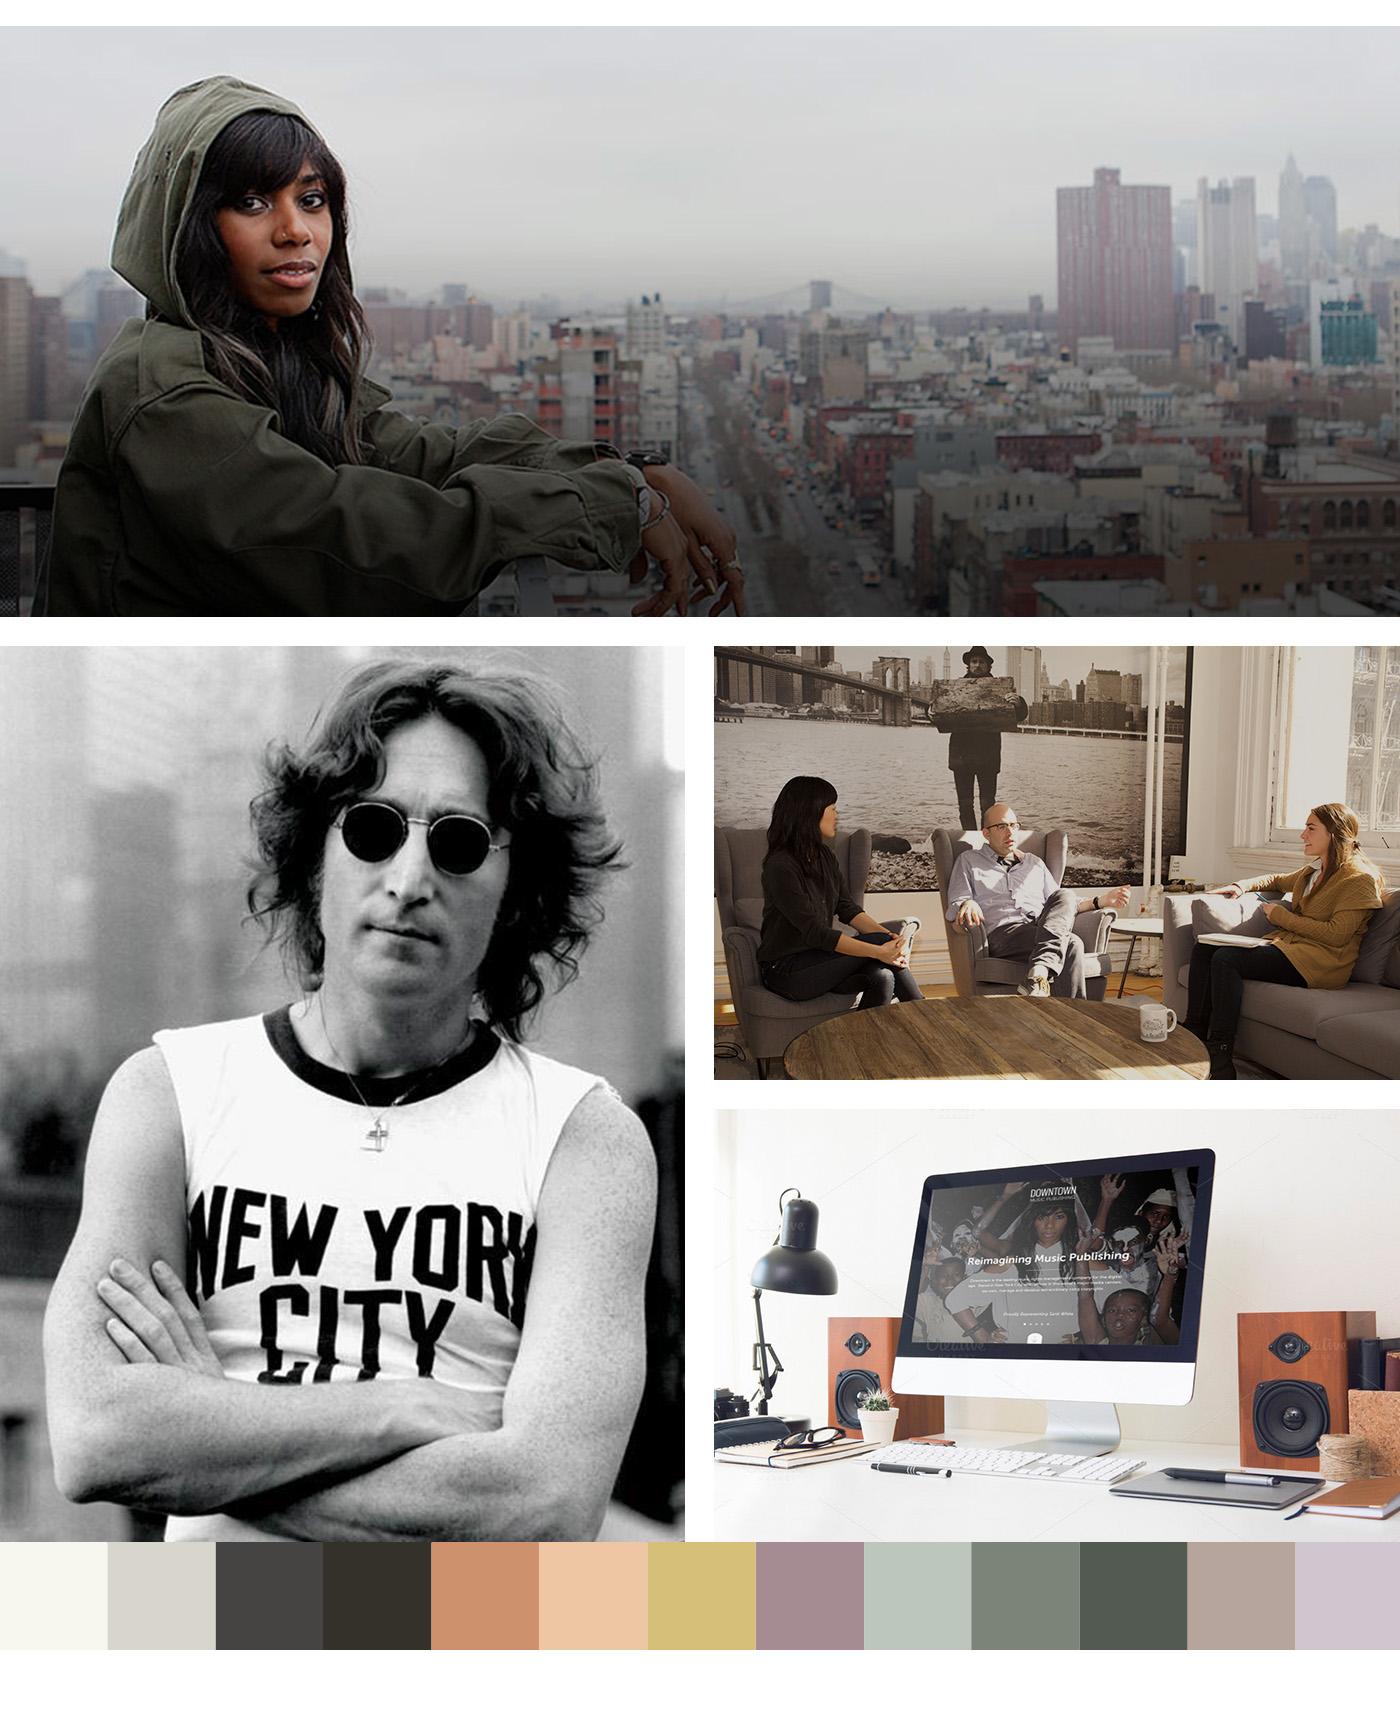 zmaic-downtown-music-publishing-dmp_branding-art-direction-photo-curation-light-sepia-color-palette.jpg